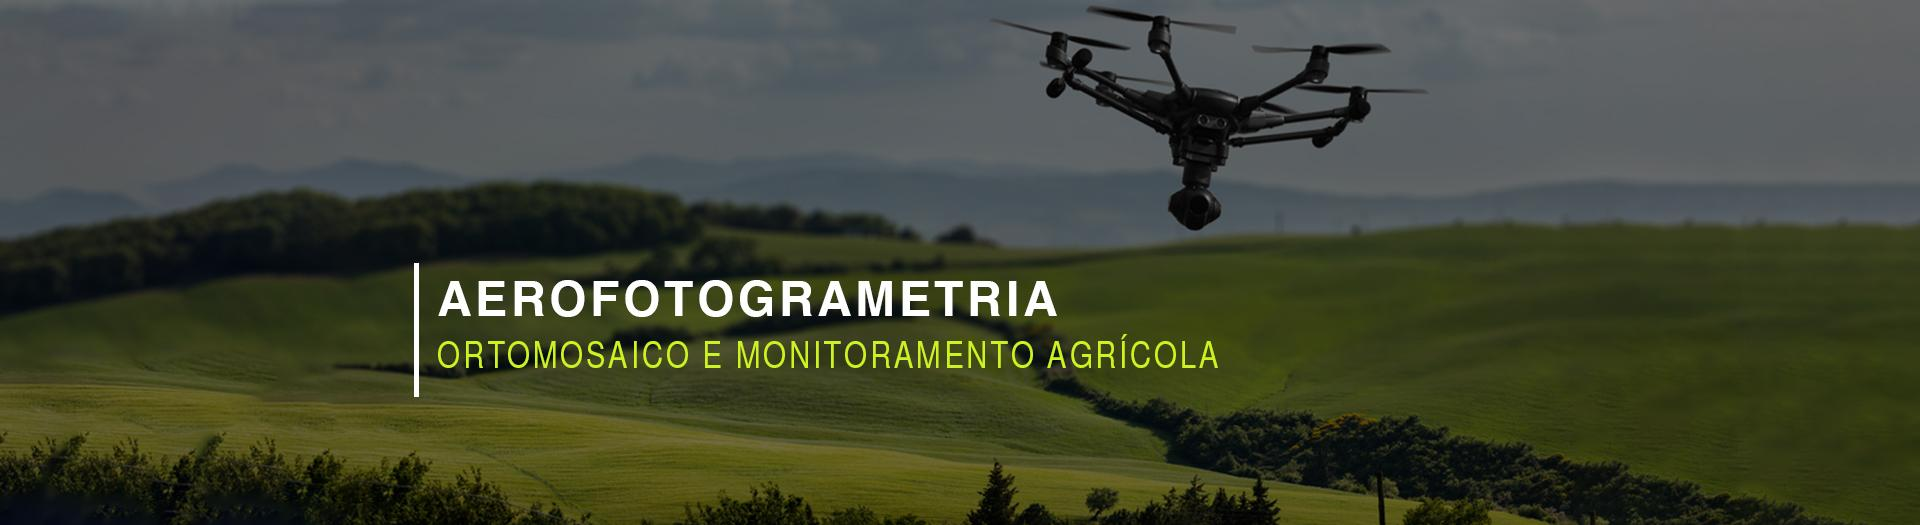 156633495225_aerofotogrametria_agricola.jpg